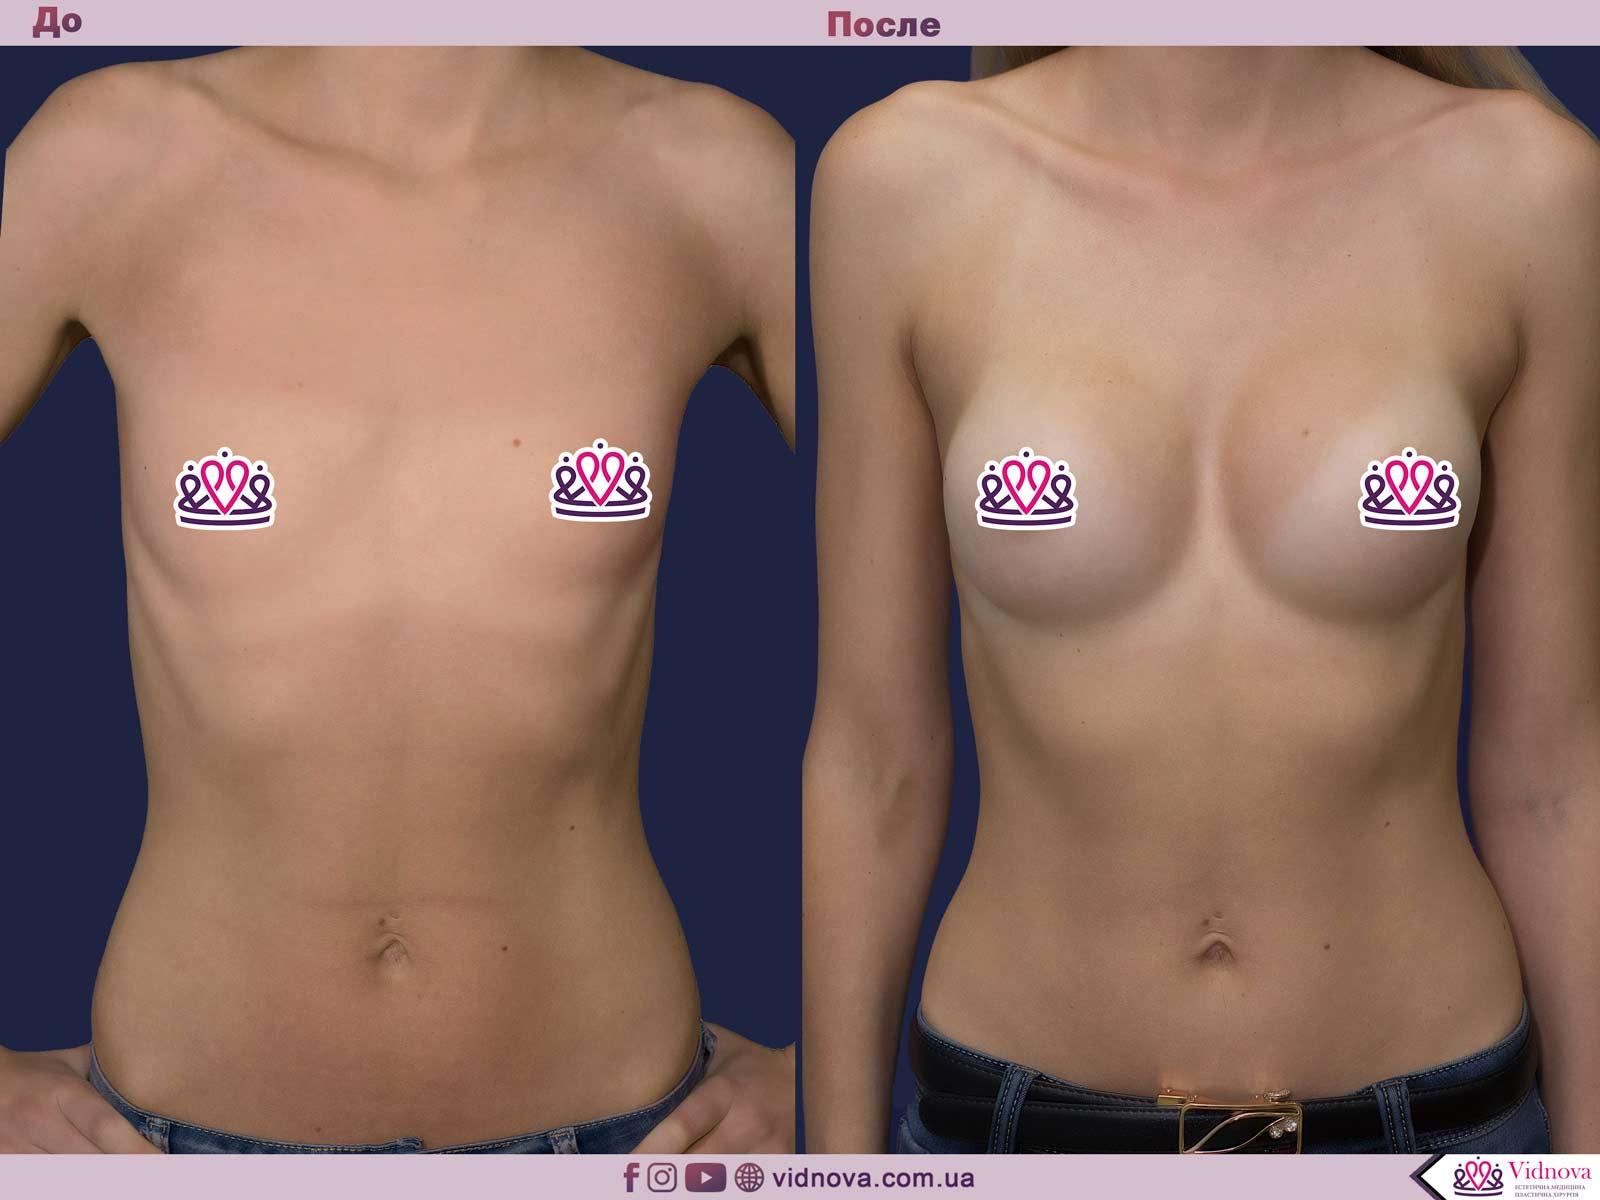 Увеличение груди: Фото ДО и ПОСЛЕ - Пример №83-1 - Клиника Vidnova